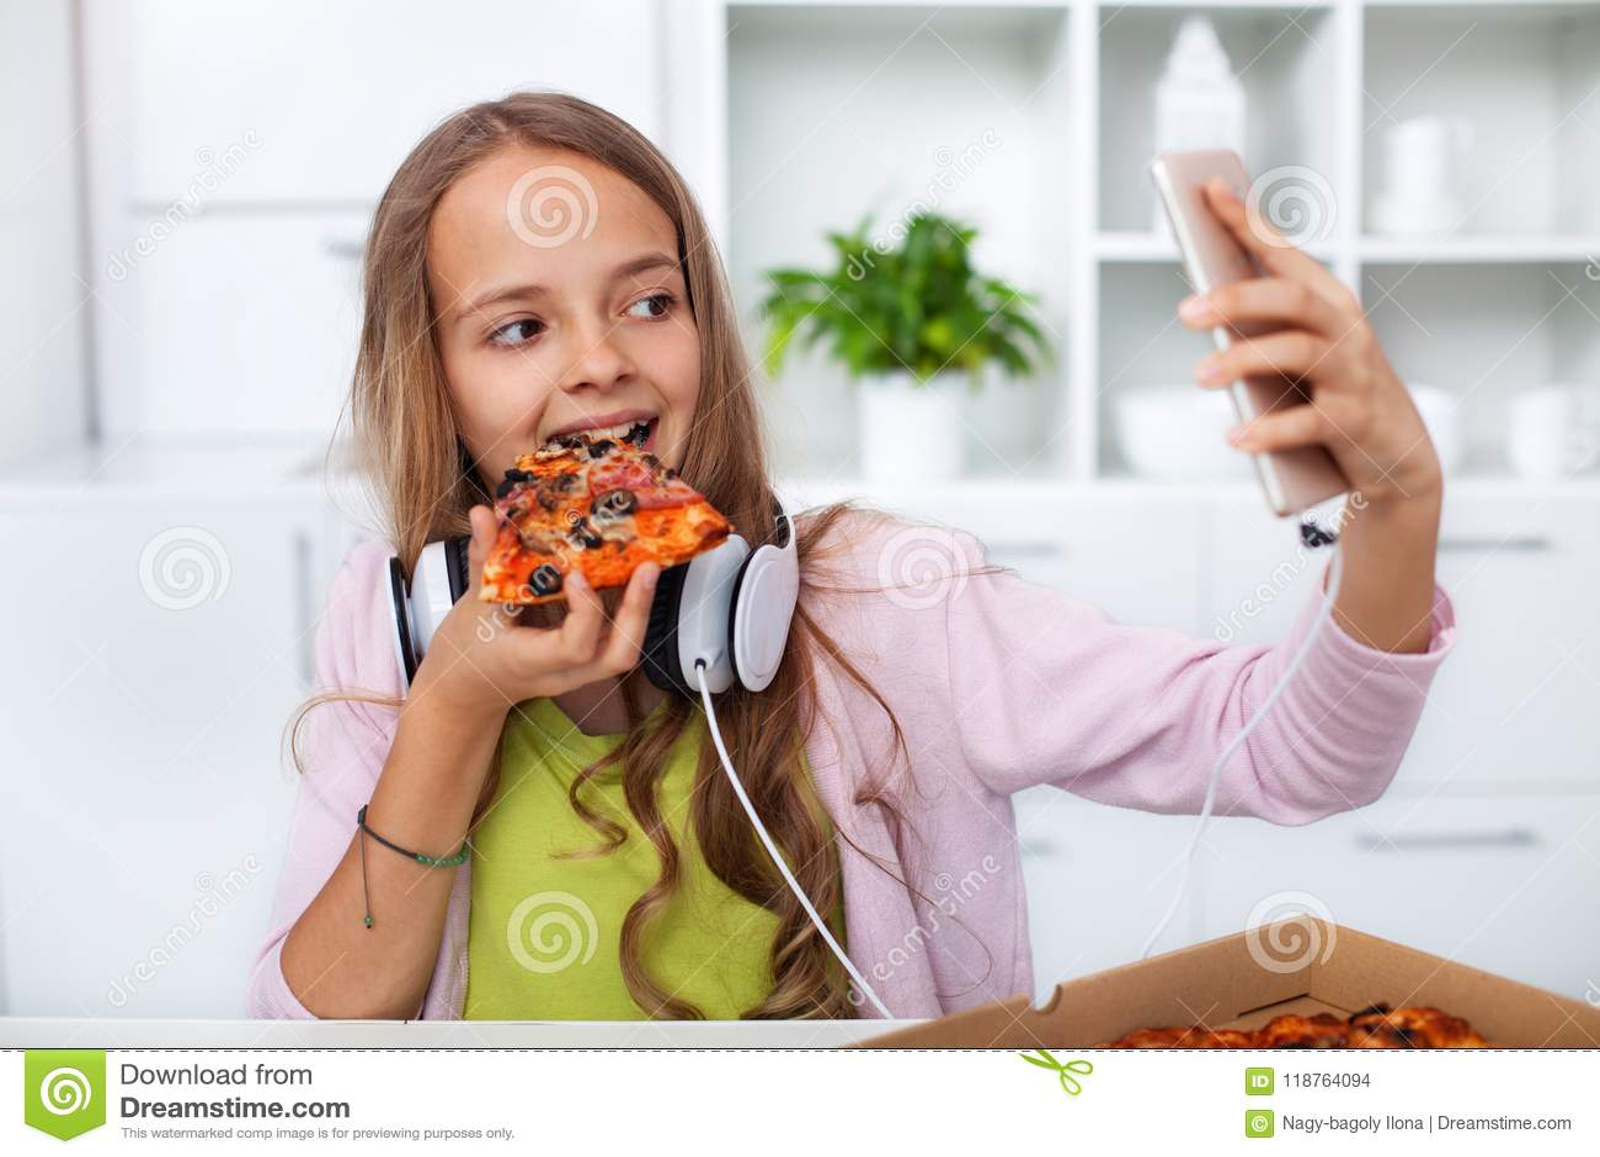 Jeune fille d adolescent mangeant de la pizza dans la cuisine - fabrication d un selfi